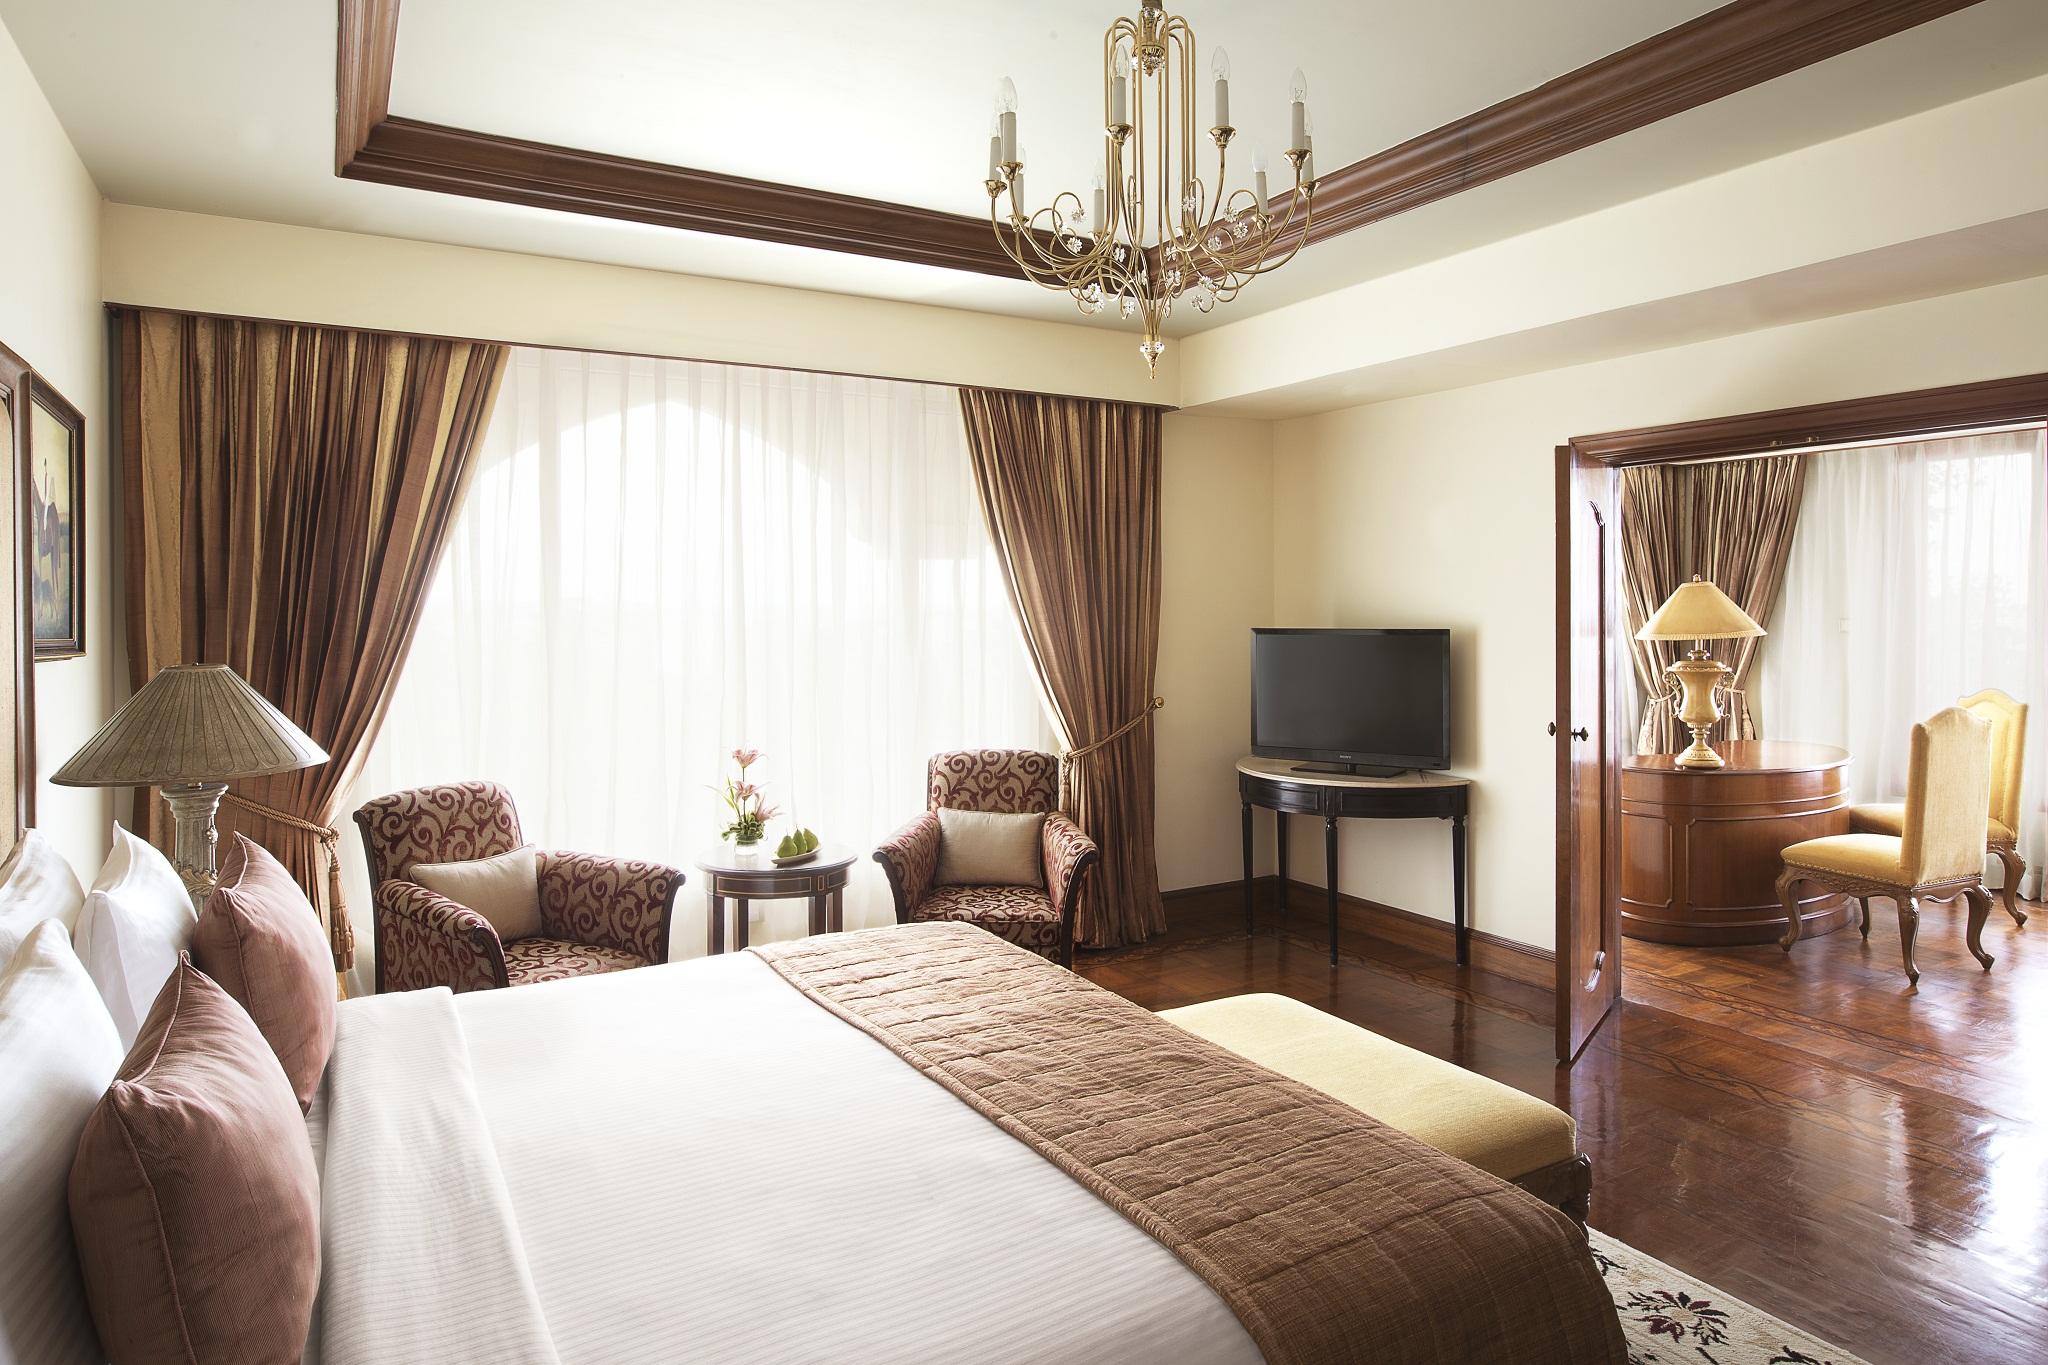 Luxurious Deluxe Suites At Taj Krishna Hyderabad